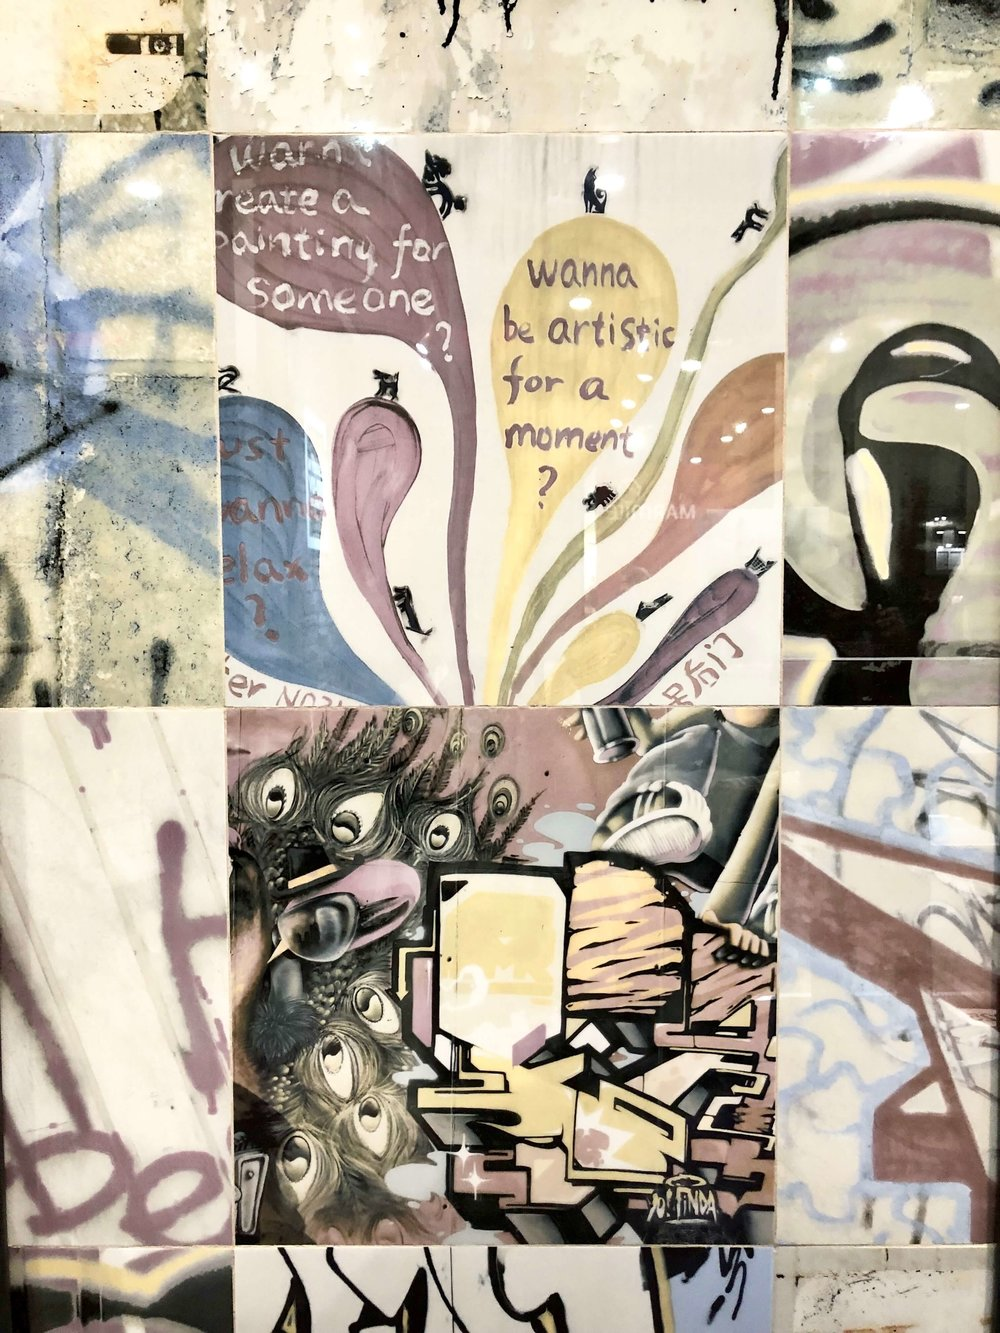 Graffiti tiles | KBIS 2019 Surfaces Trends